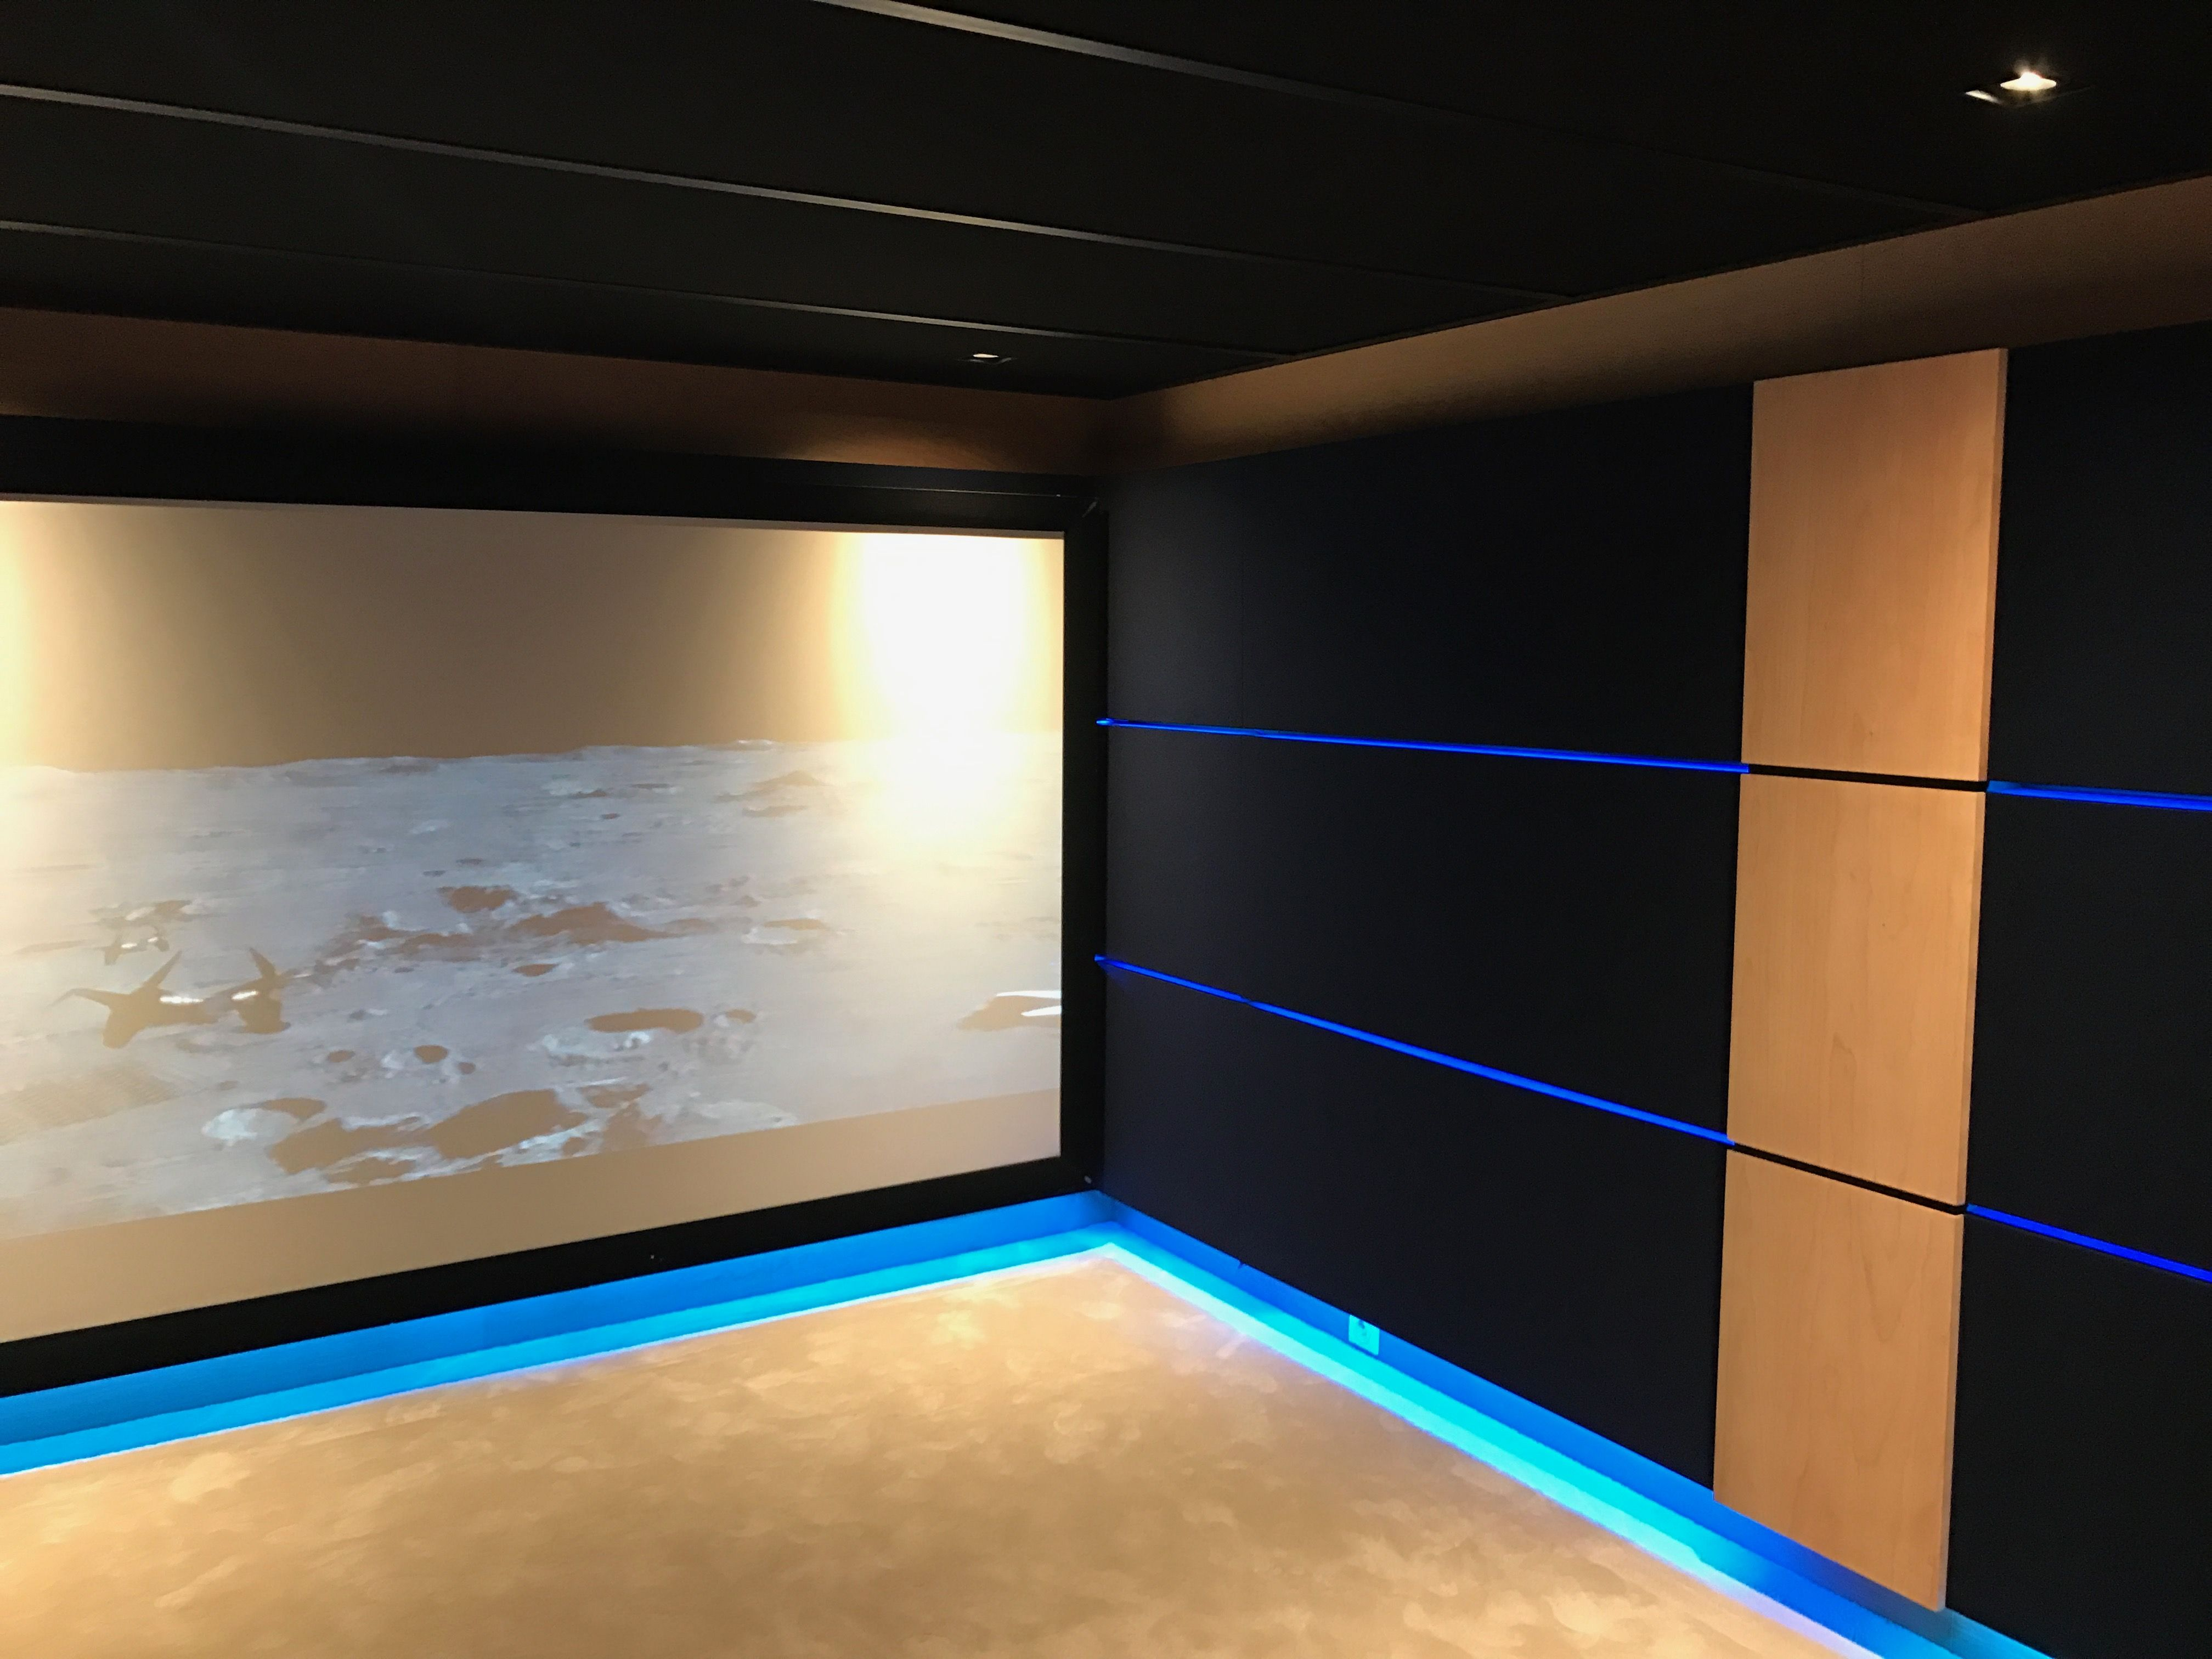 Salle De Cinema Privee Sur Mesure Art Sound Du Sol Au